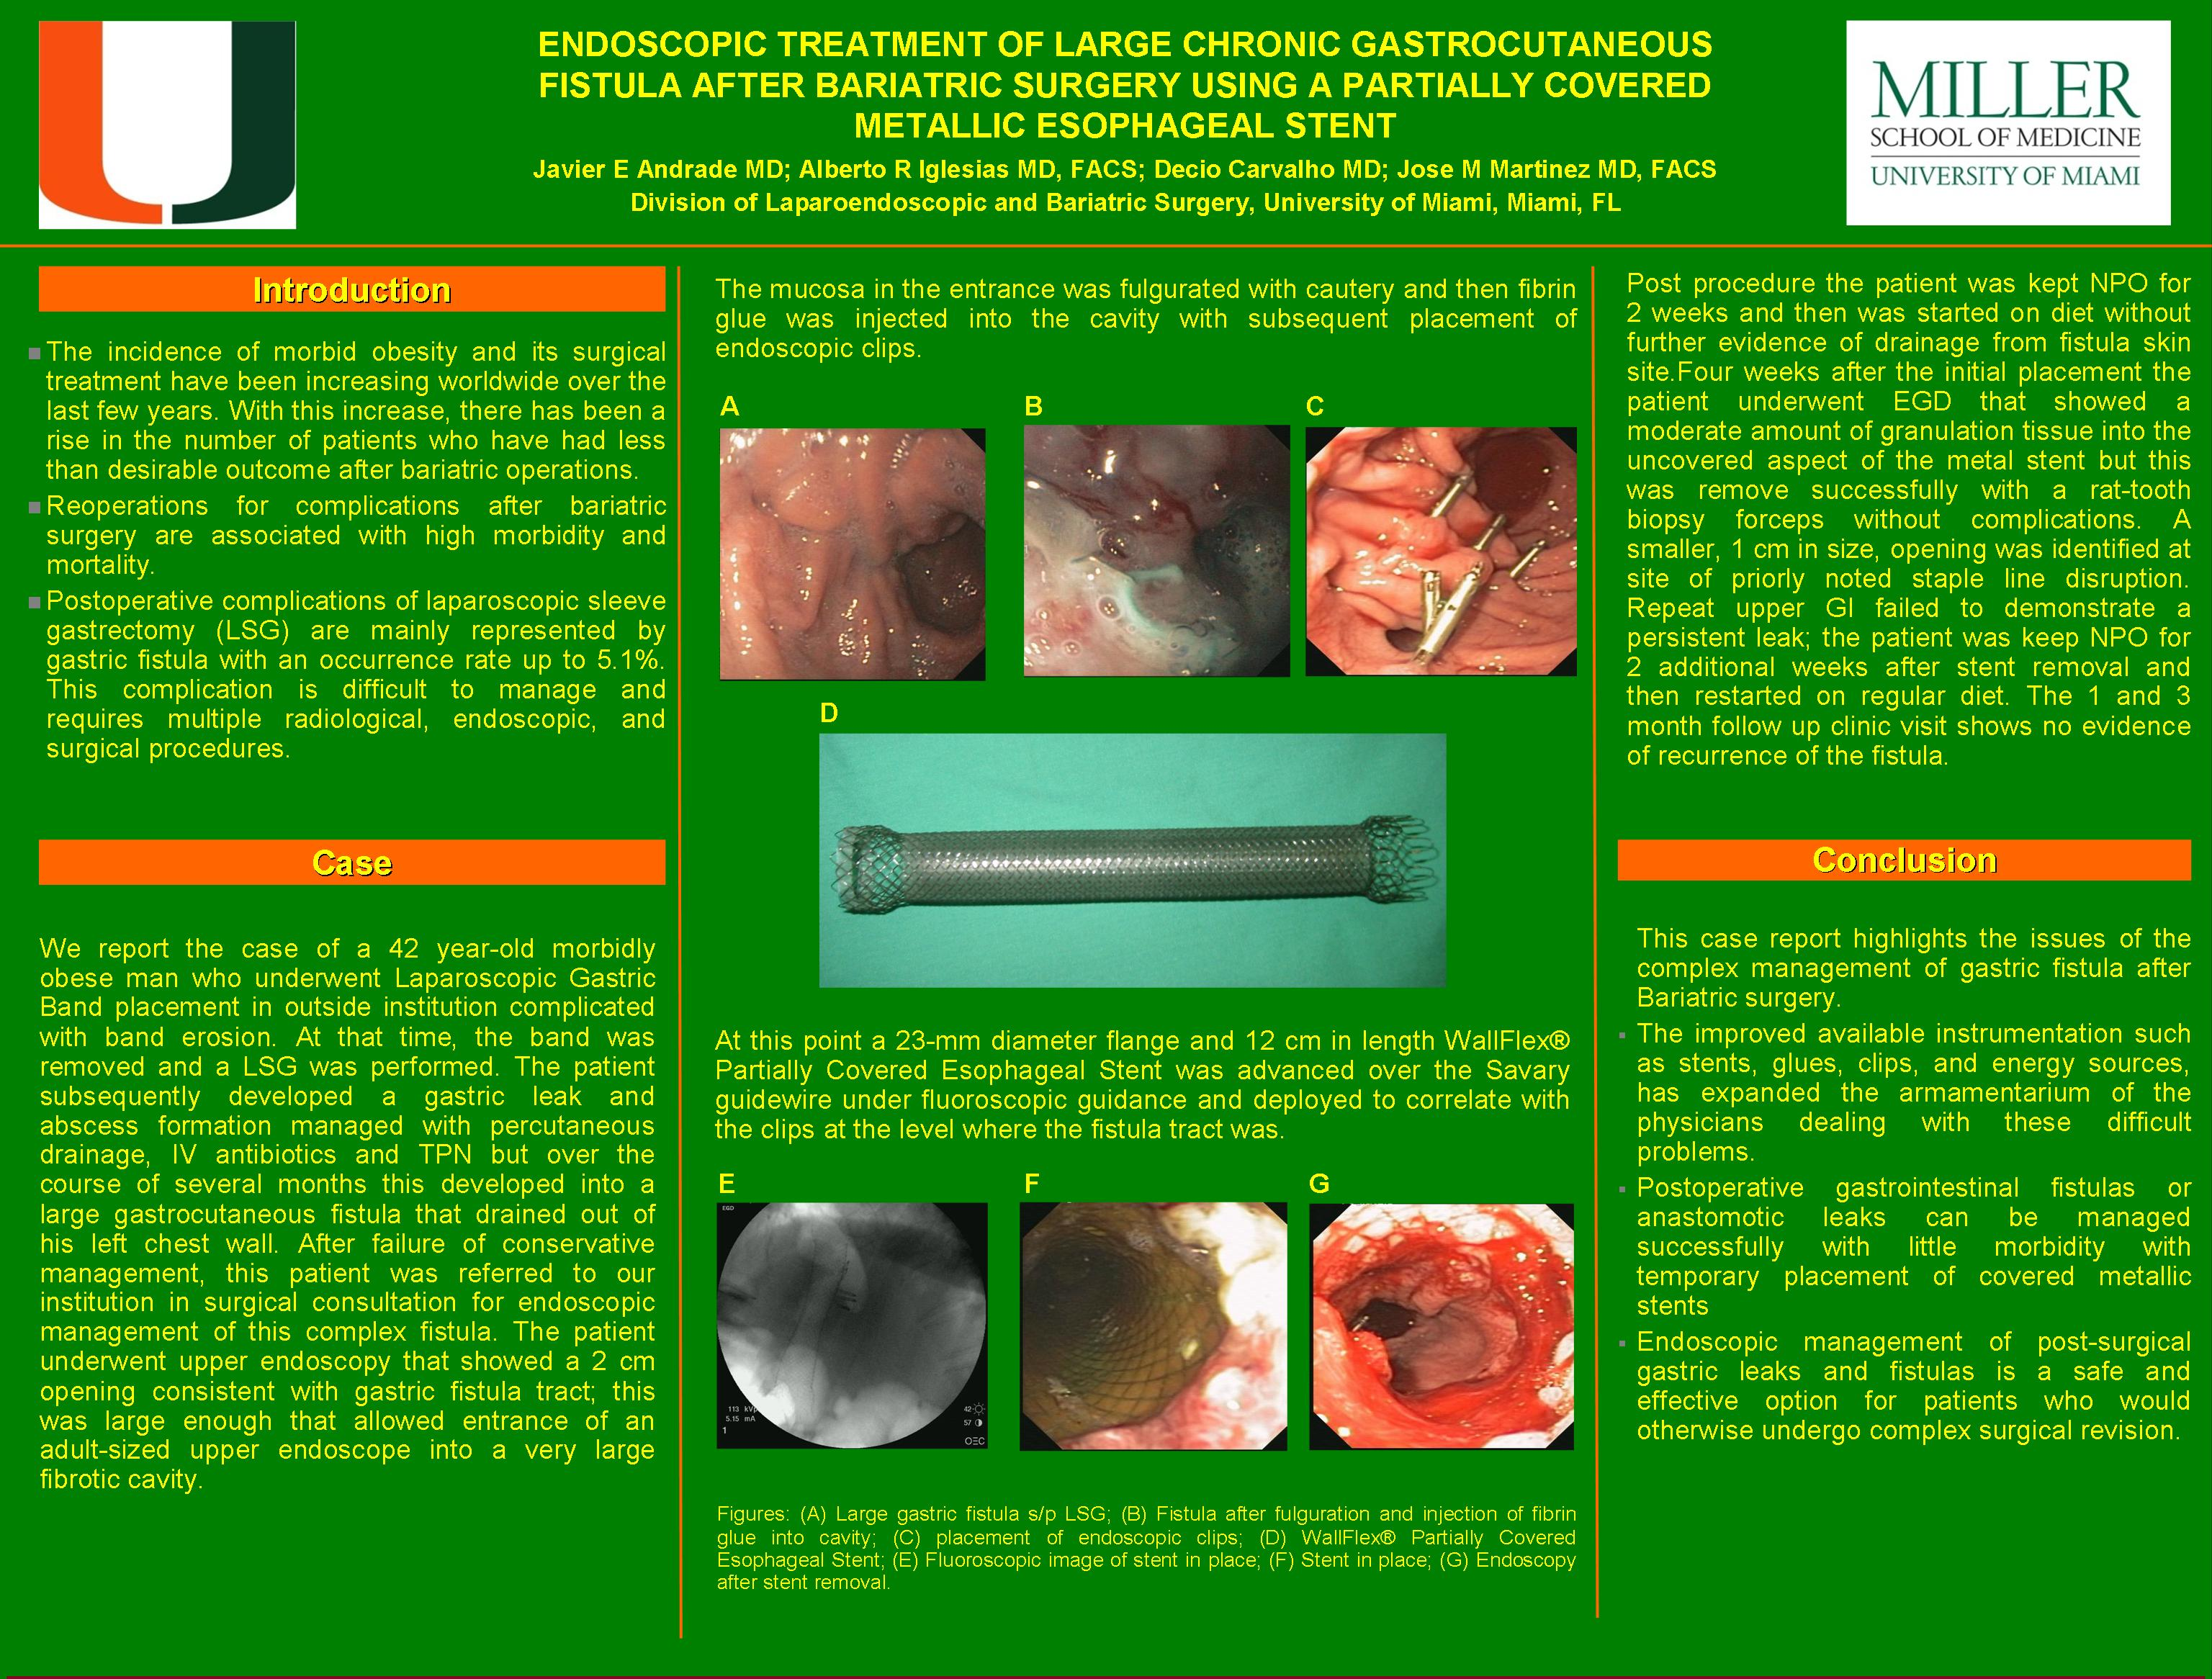 Endoscopic Treatment Of Large Chronic Gastrocutaneous Fistula After